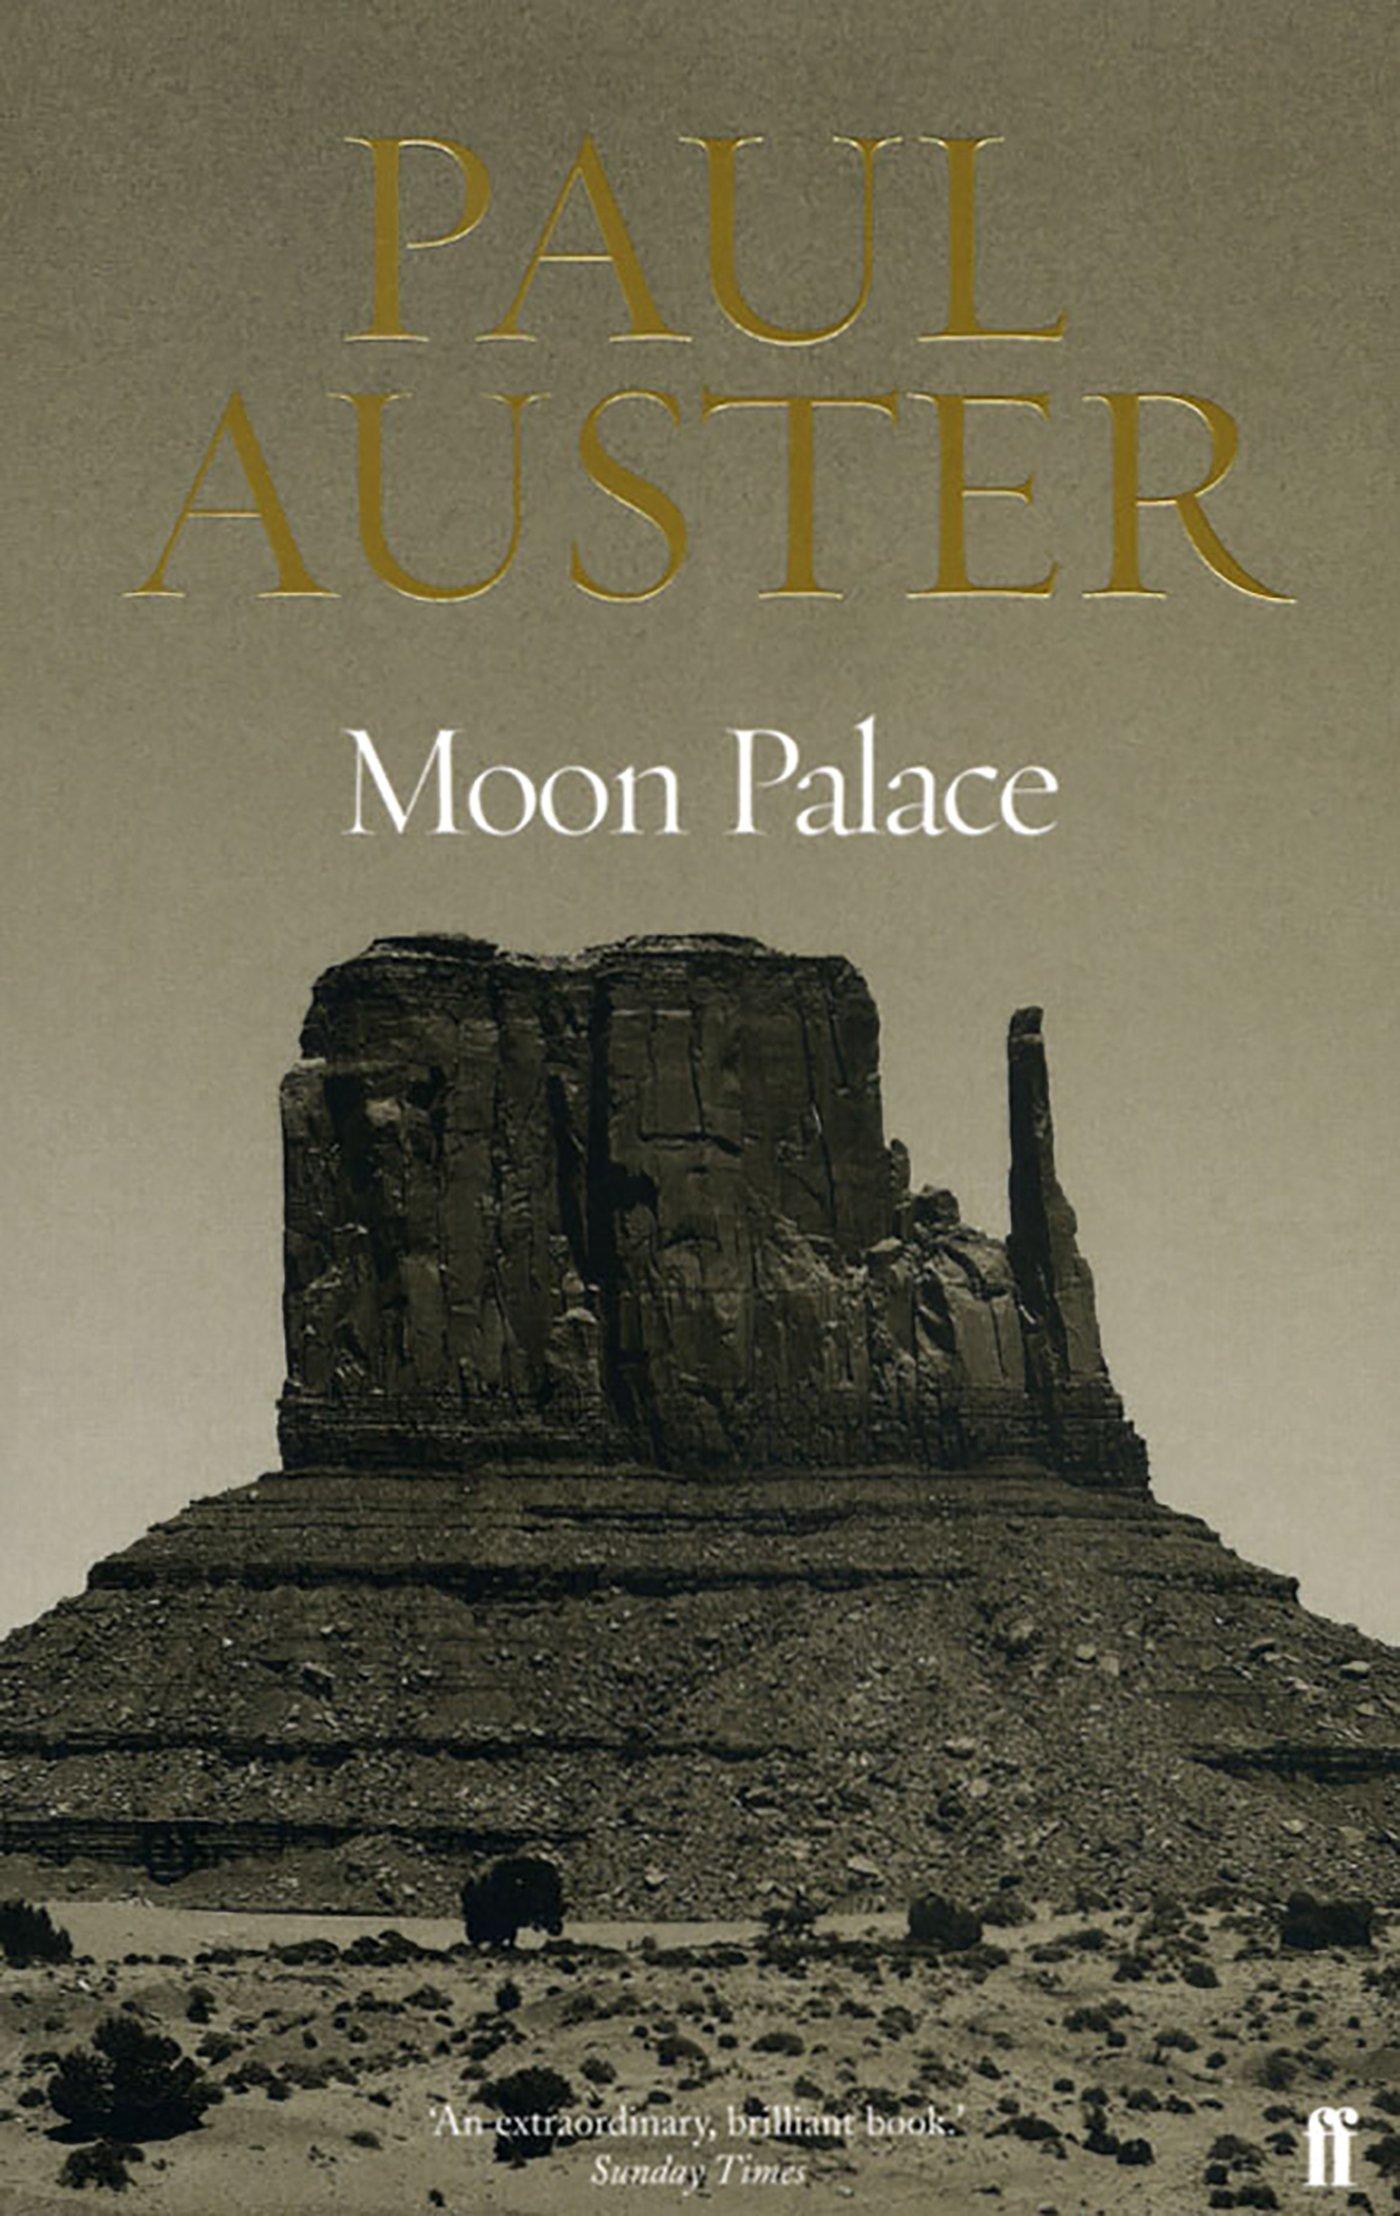 moon palace paul auster full novel